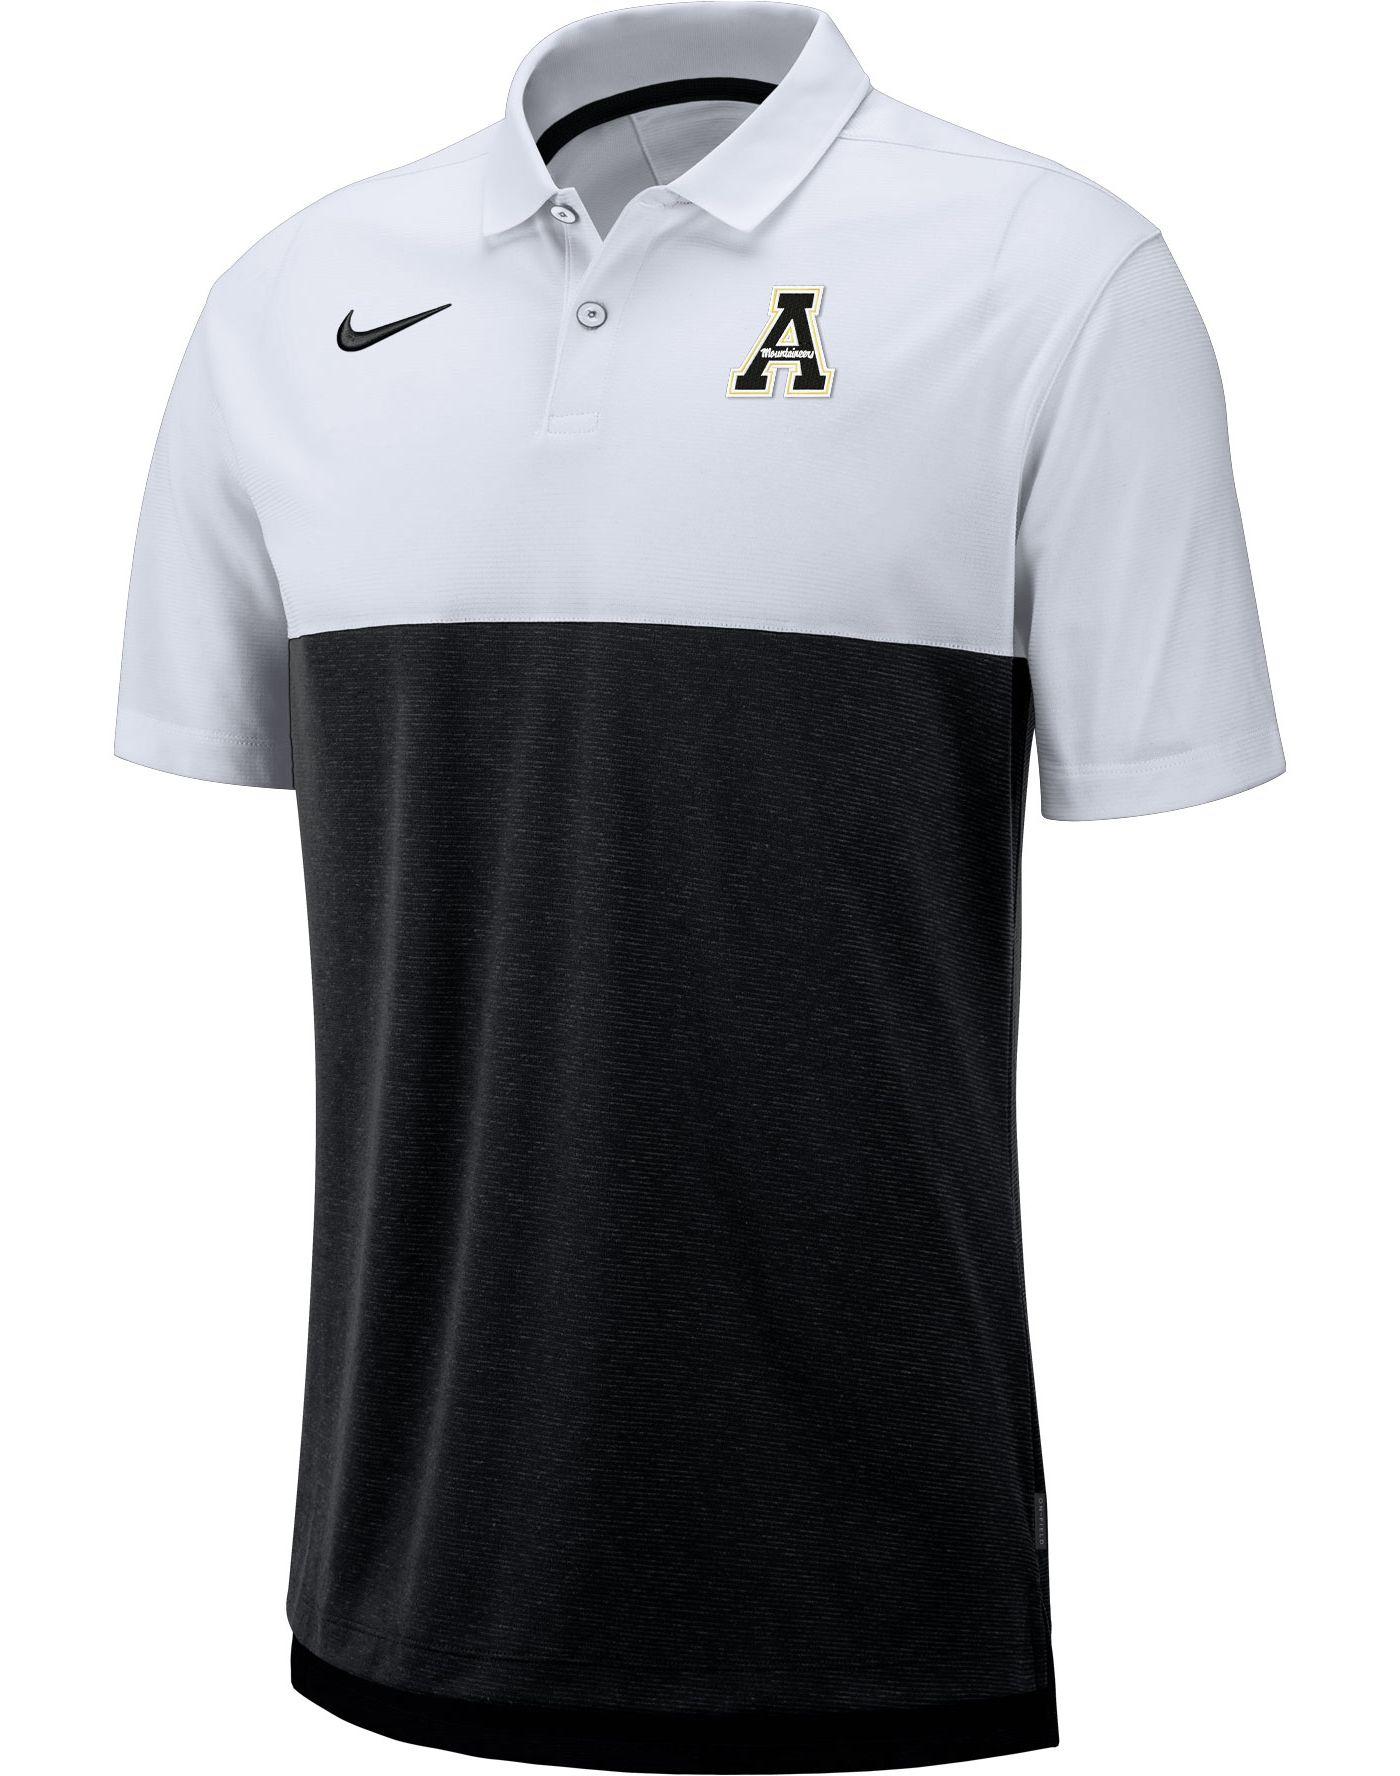 Nike Men's Appalachian State Mountaineers White/Black Dri-FIT Breathe Football Sideline Polo